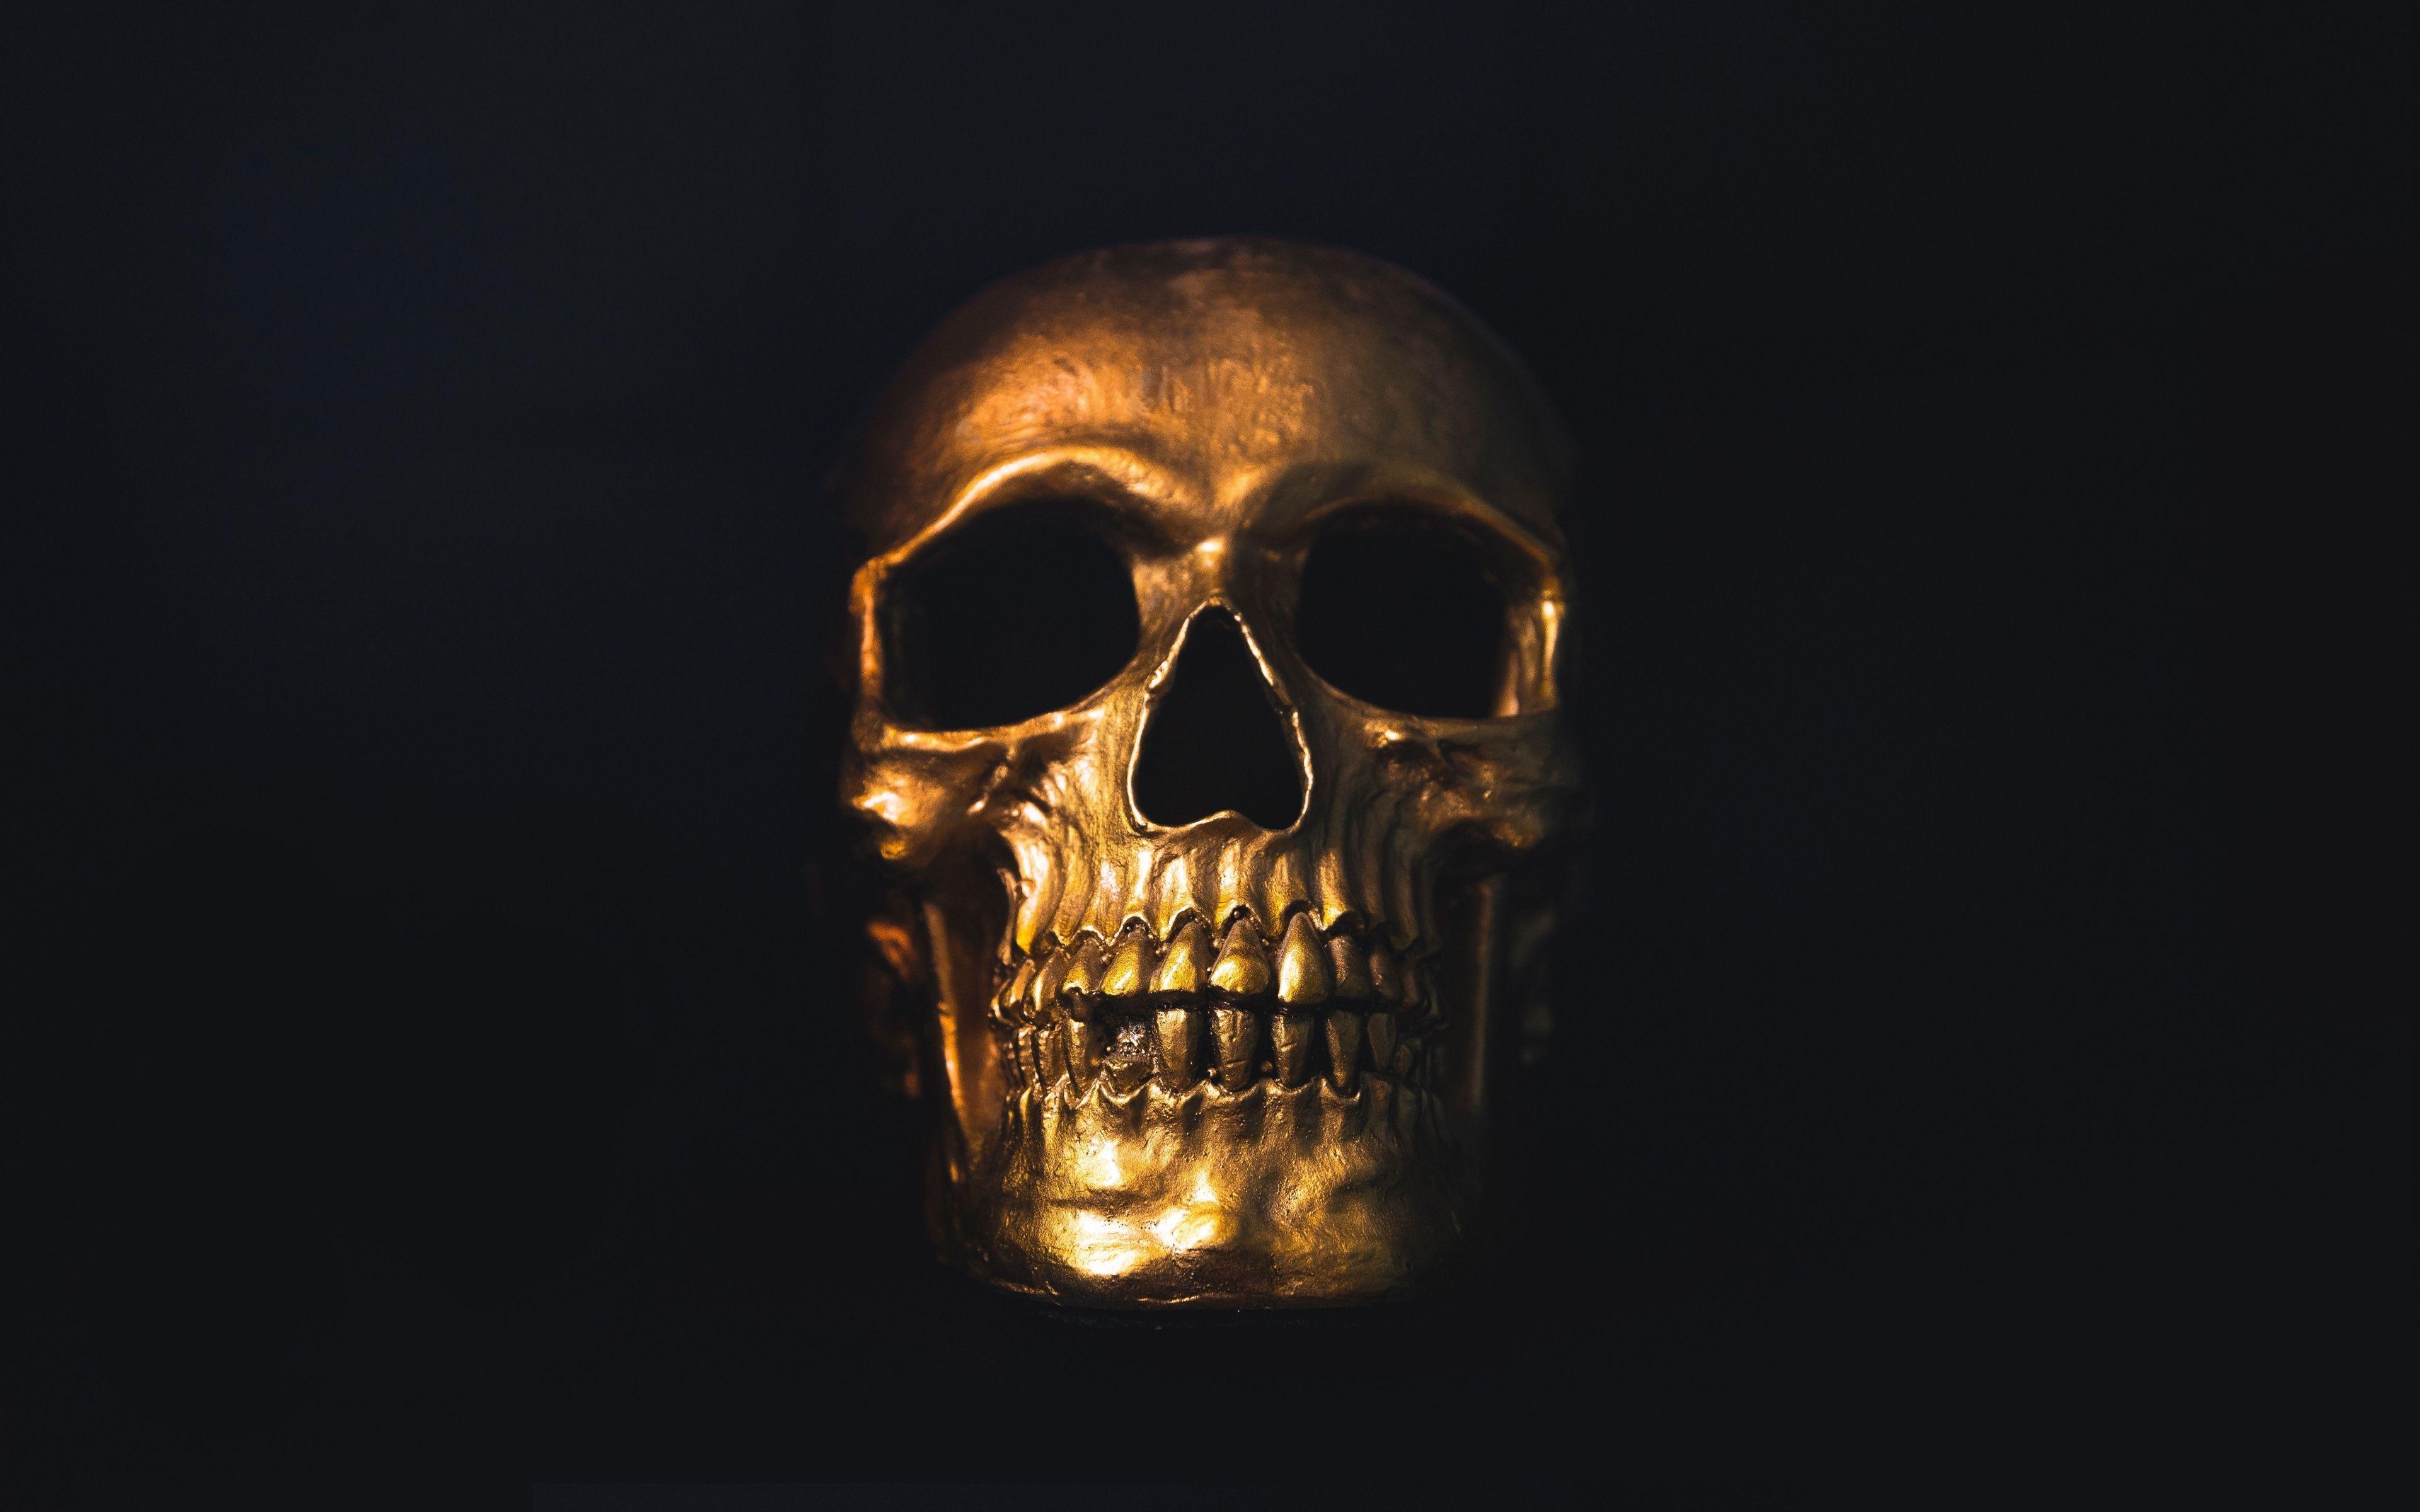 4k Ultra Hd Skull Wallpapers Top Free 4k Ultra Hd Skull Backgrounds Wallpaperaccess